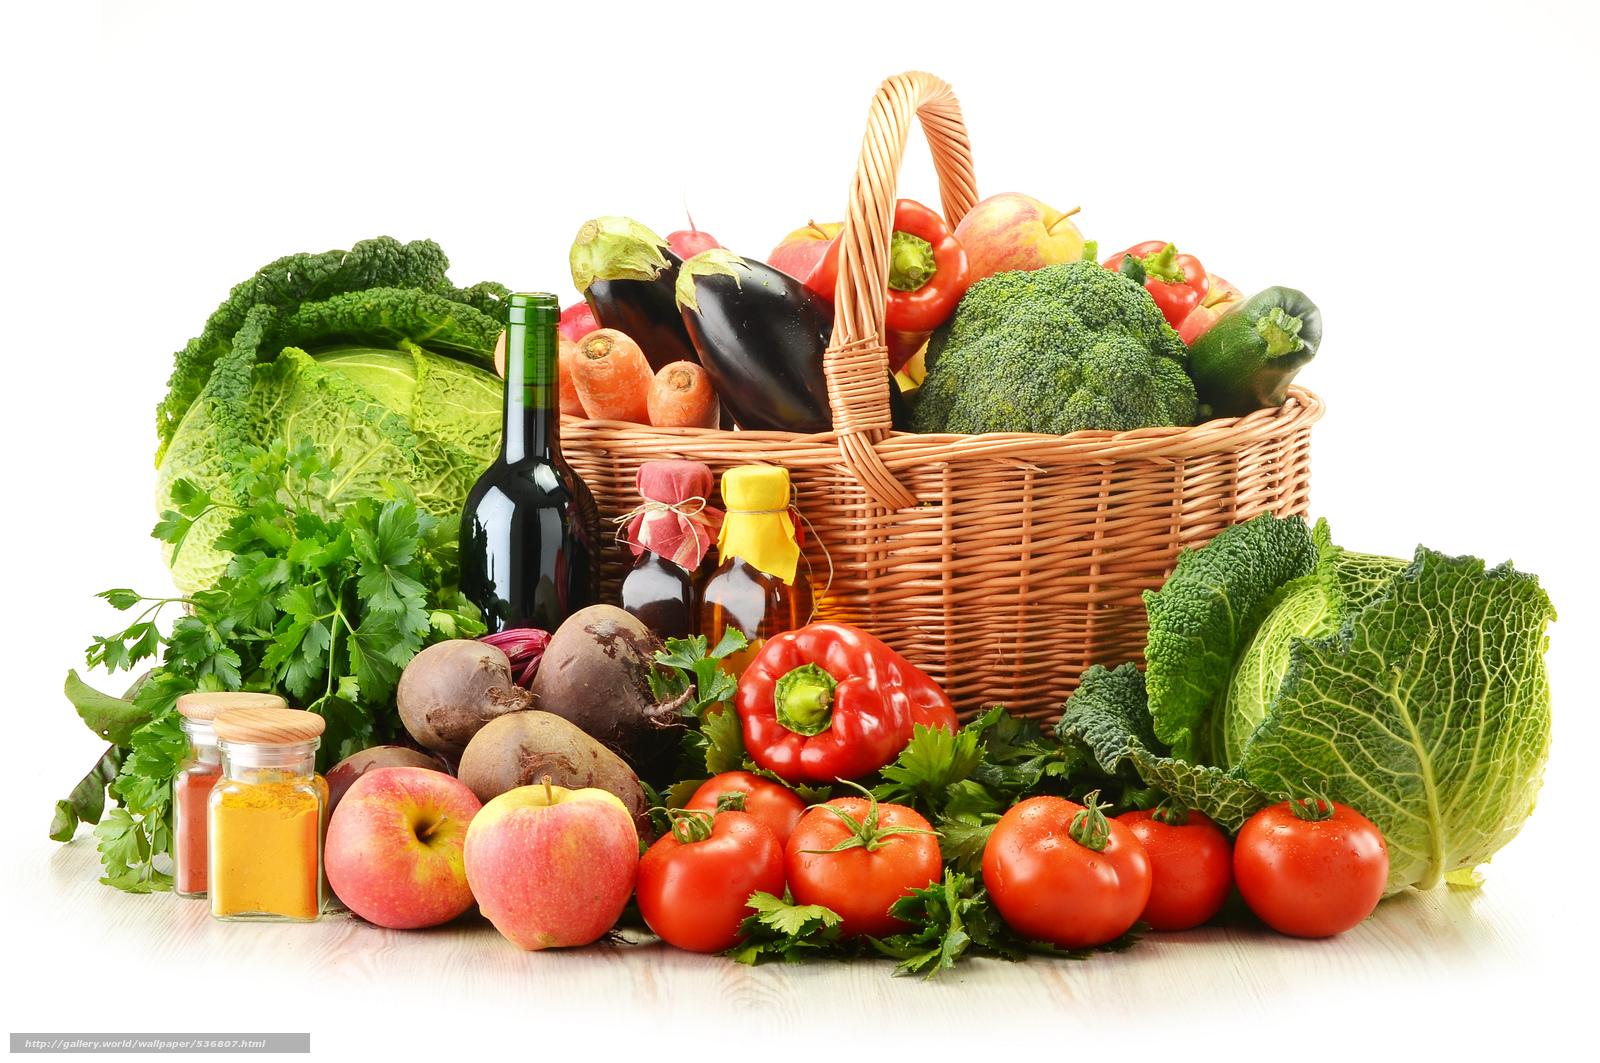 Download wallpaper harvest,  fruit,  vegetables free desktop wallpaper in the resolution 8688x5772 — picture №536807